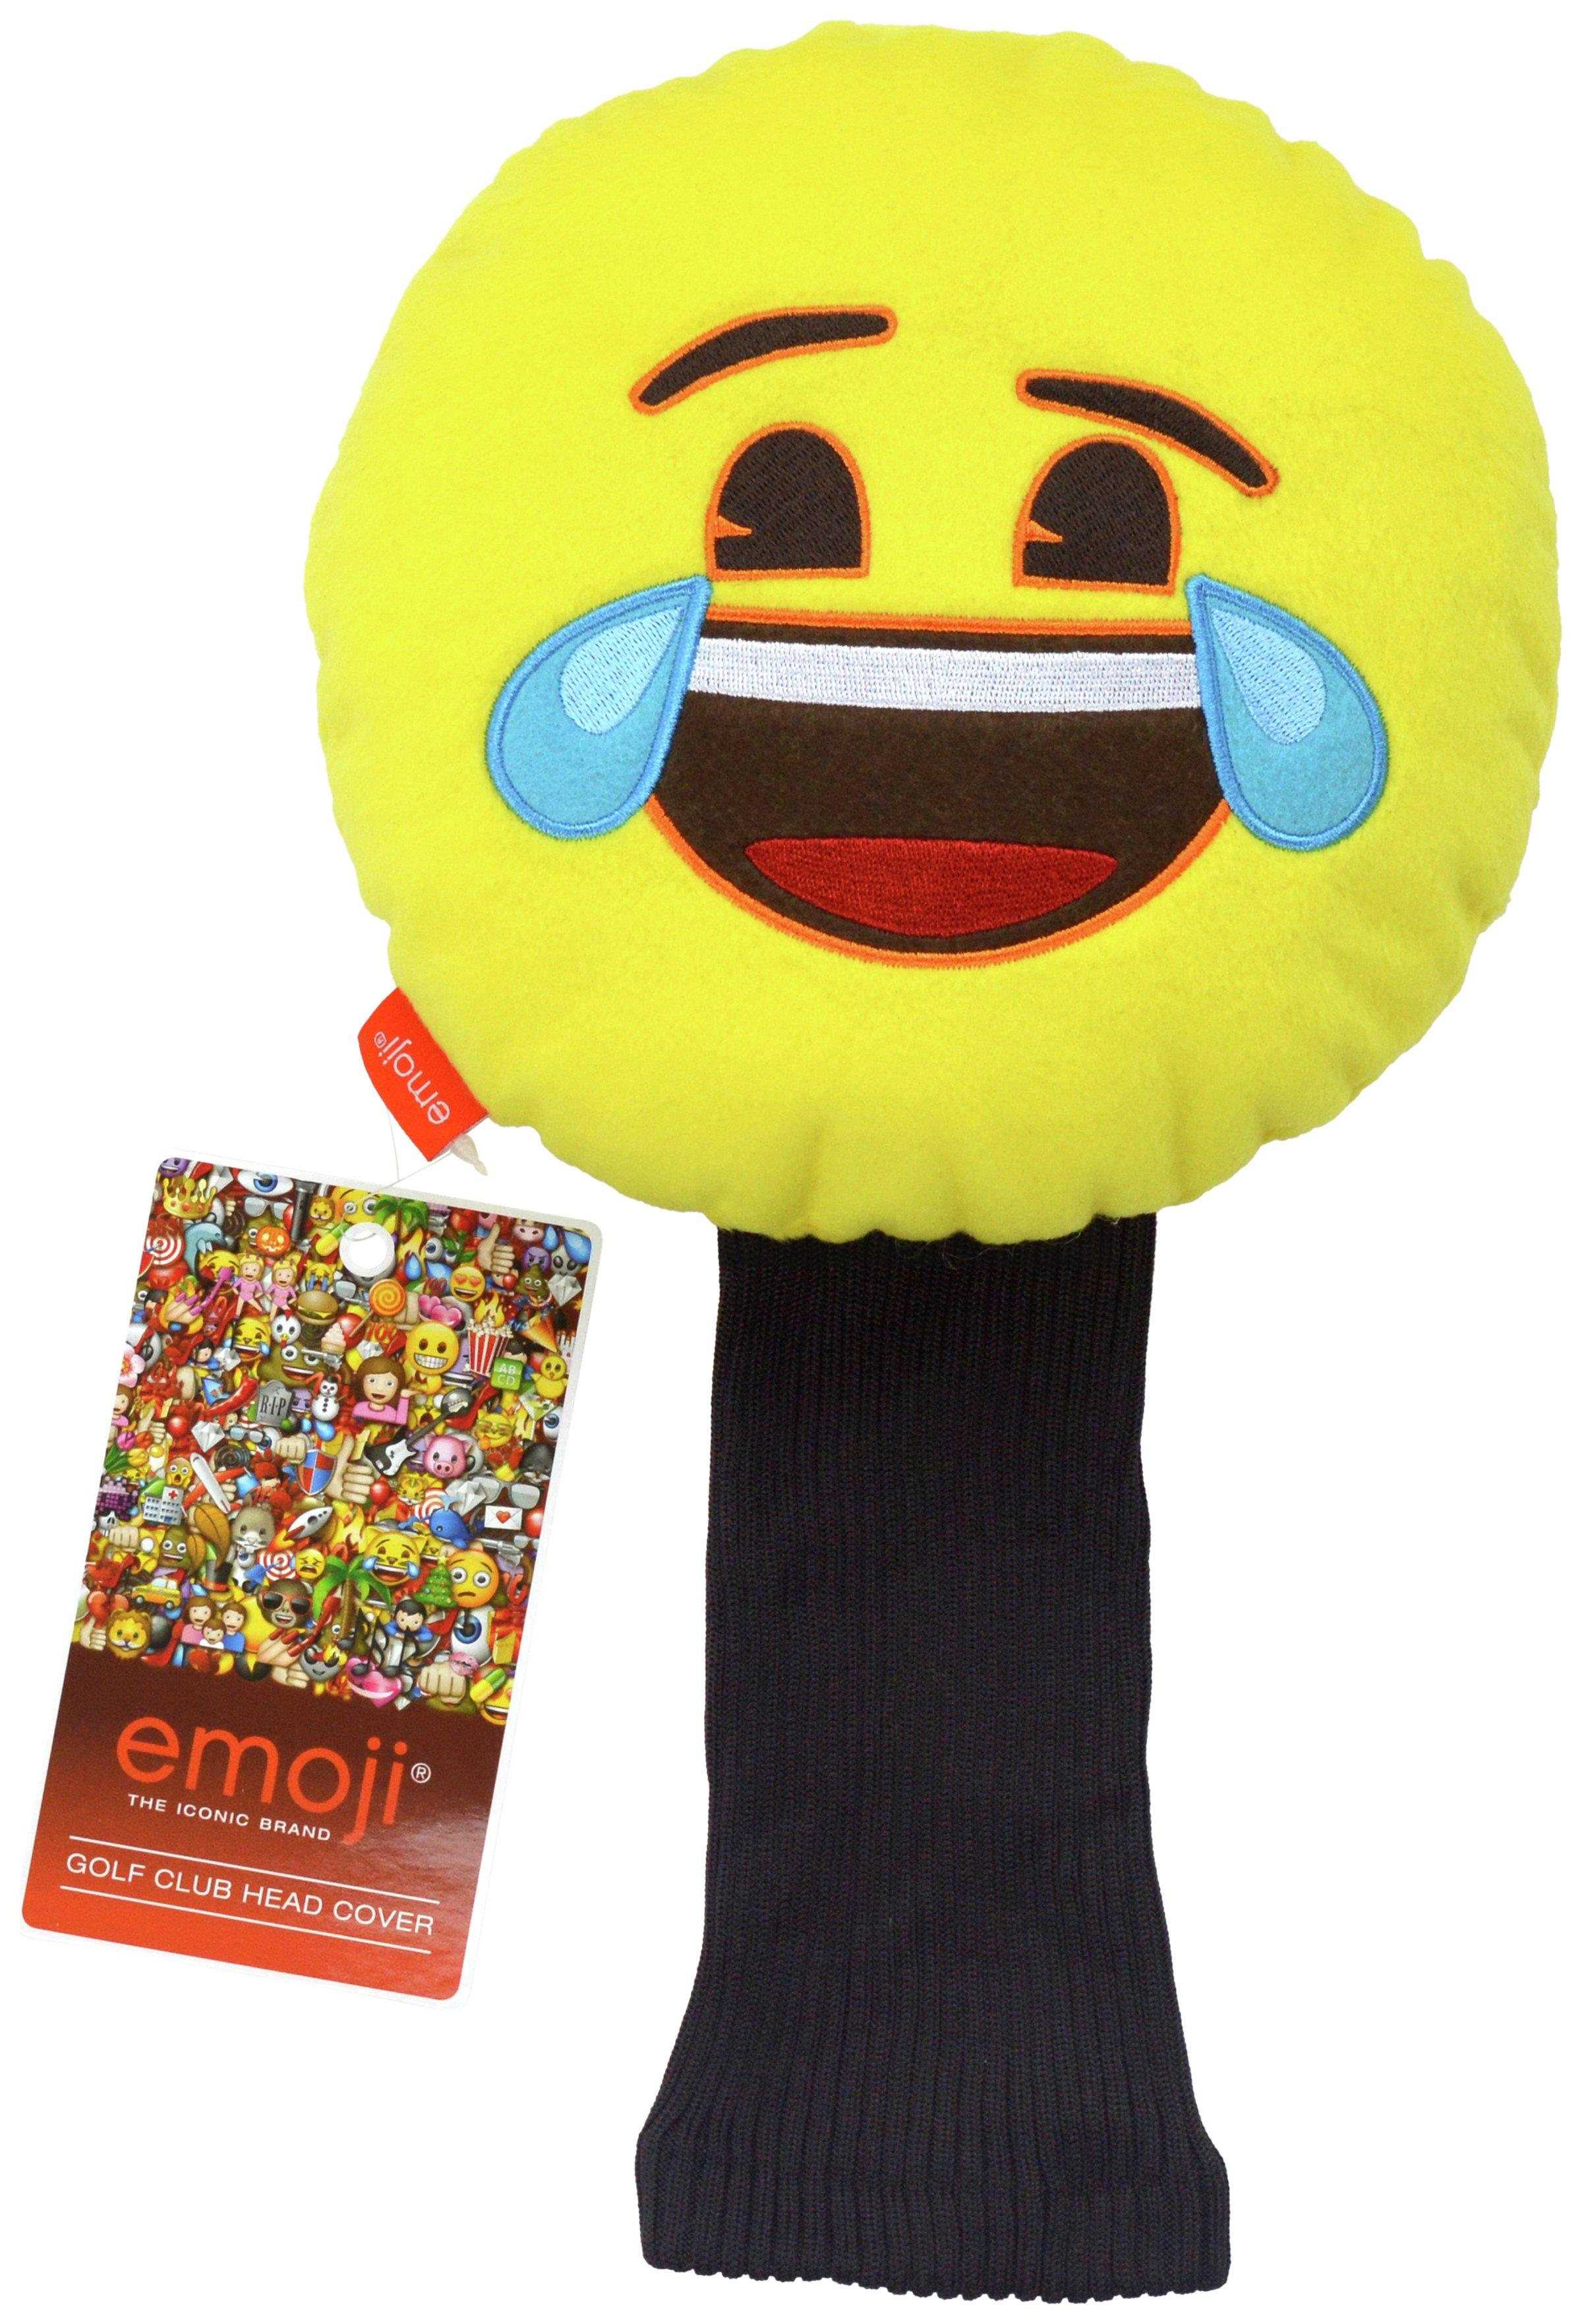 Emoji Golf Headcover - Laughing